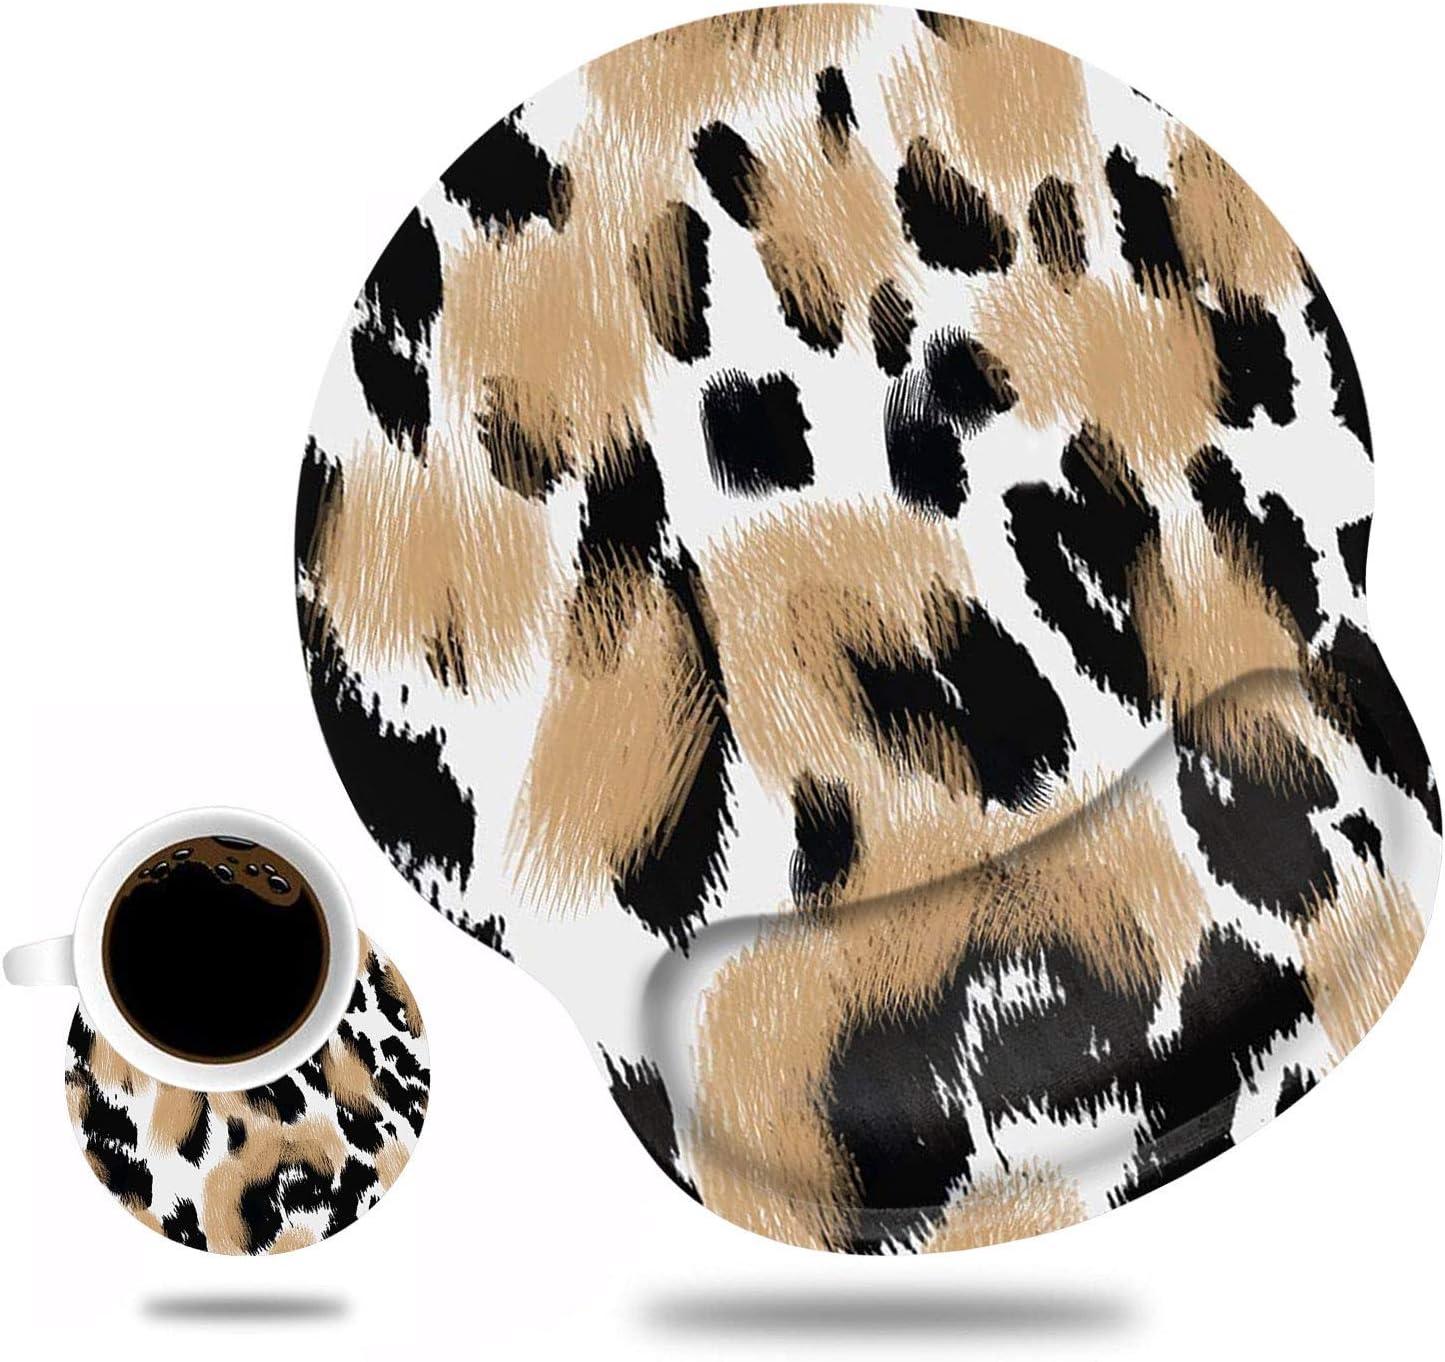 Ergonomic Mouse Pad Wrist Support and Coaster Ranking TOP1 Non Cute S Coffee Albuquerque Mall